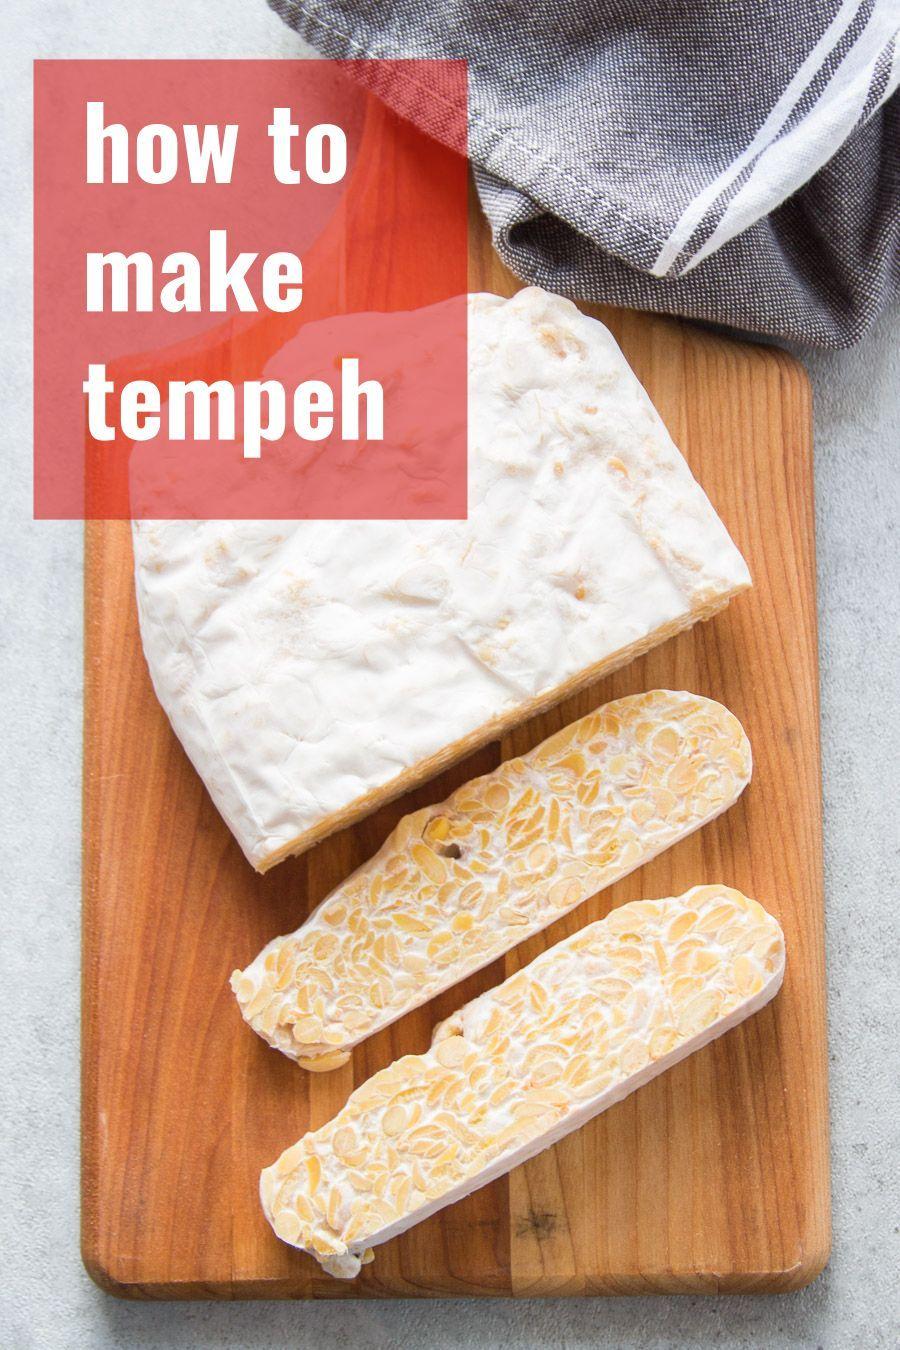 How To Make Tempeh Food Tempeh Vegetarian Recipes Easy